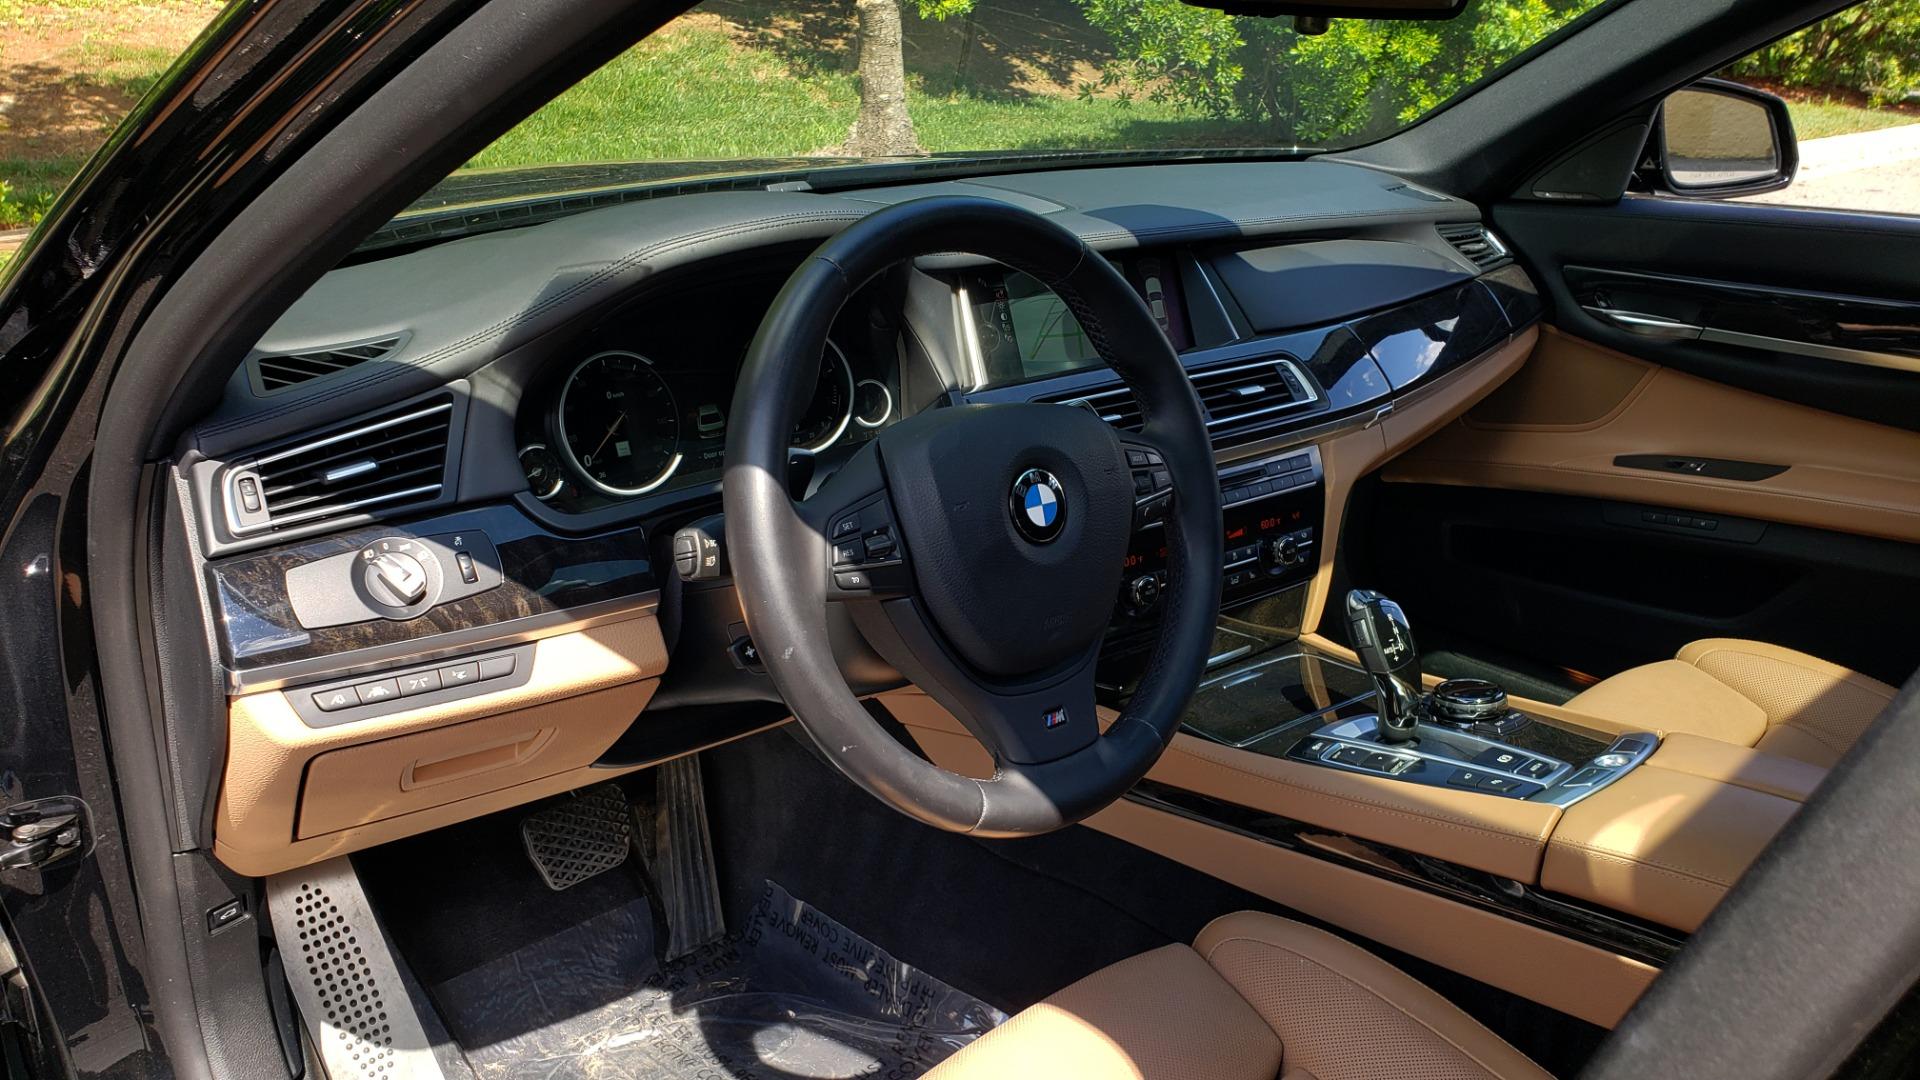 Used 2014 BMW 7 SERIES 750LI M-SPORT / EXEC PKG / DRVR ASST / LIGHTING / NAV / SUNROOF for sale Sold at Formula Imports in Charlotte NC 28227 32